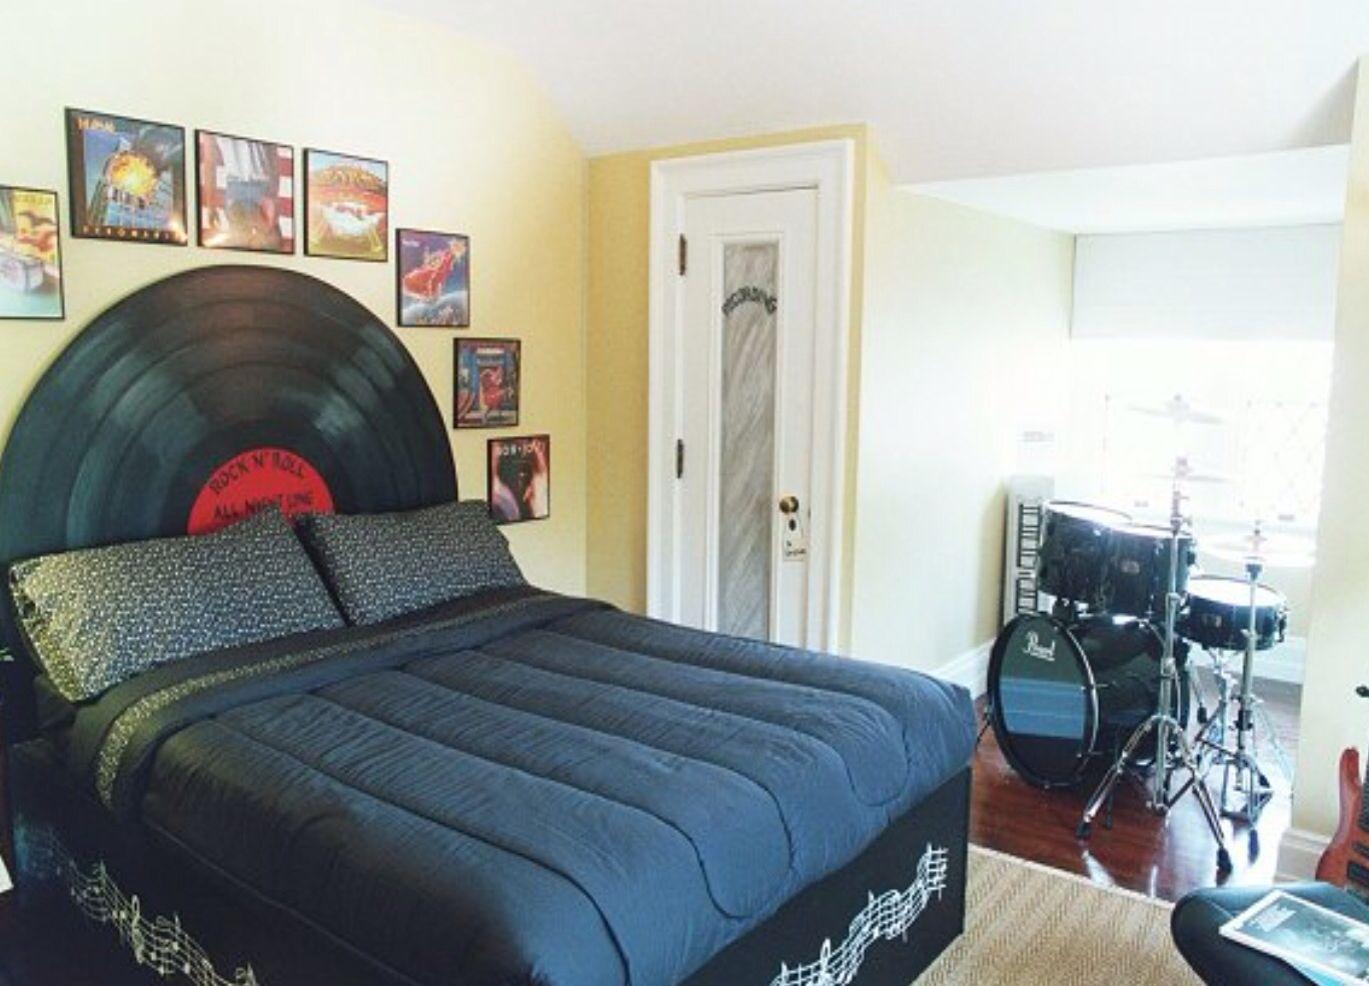 Decorating music theme bedrooms - Music Room Decor